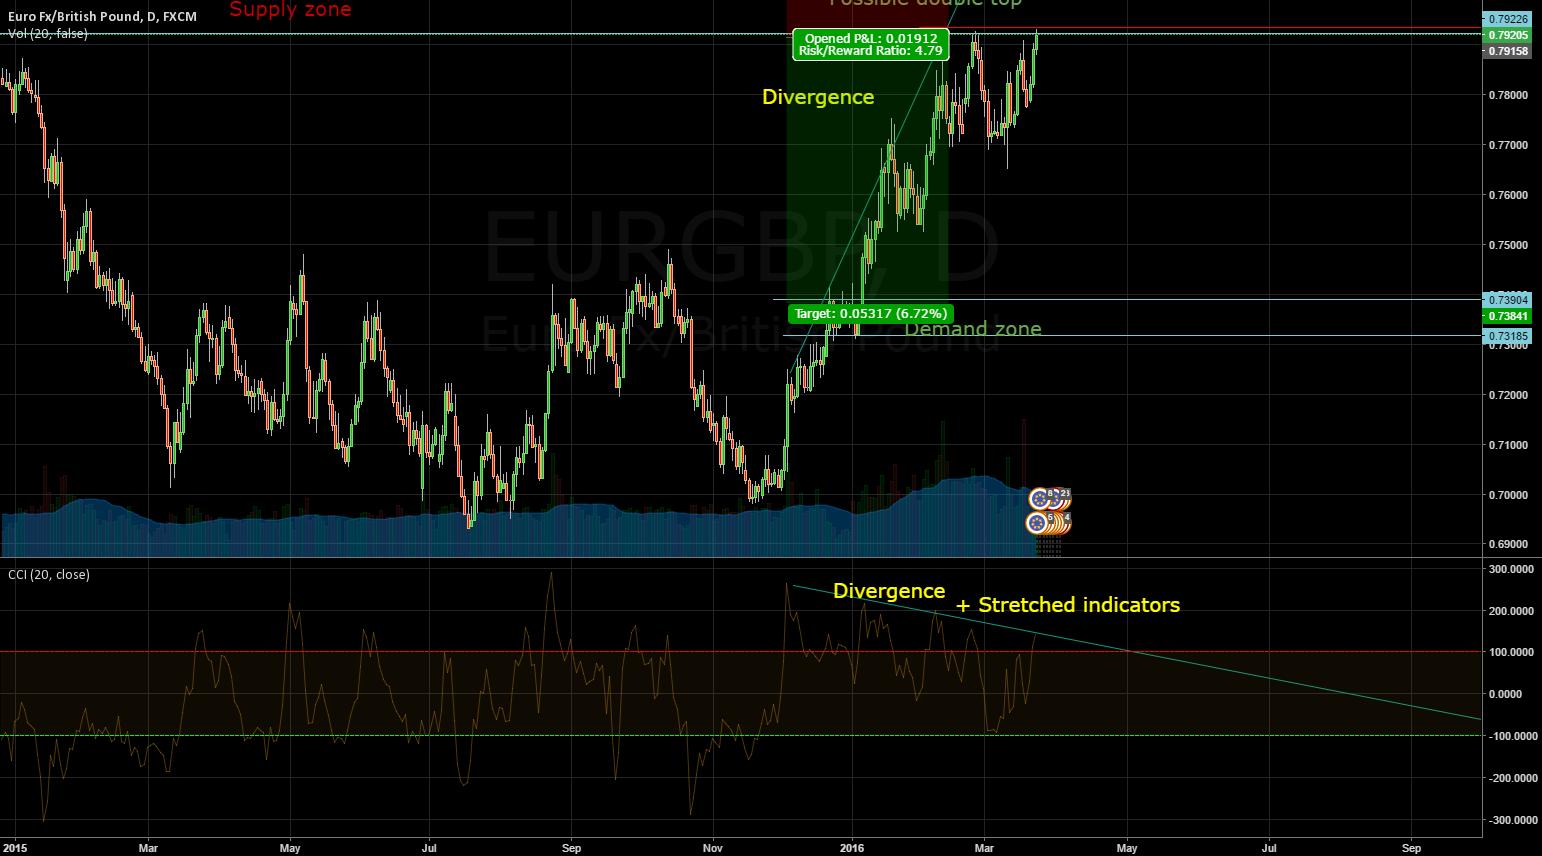 EURGBP Short opportunity @400 pip move